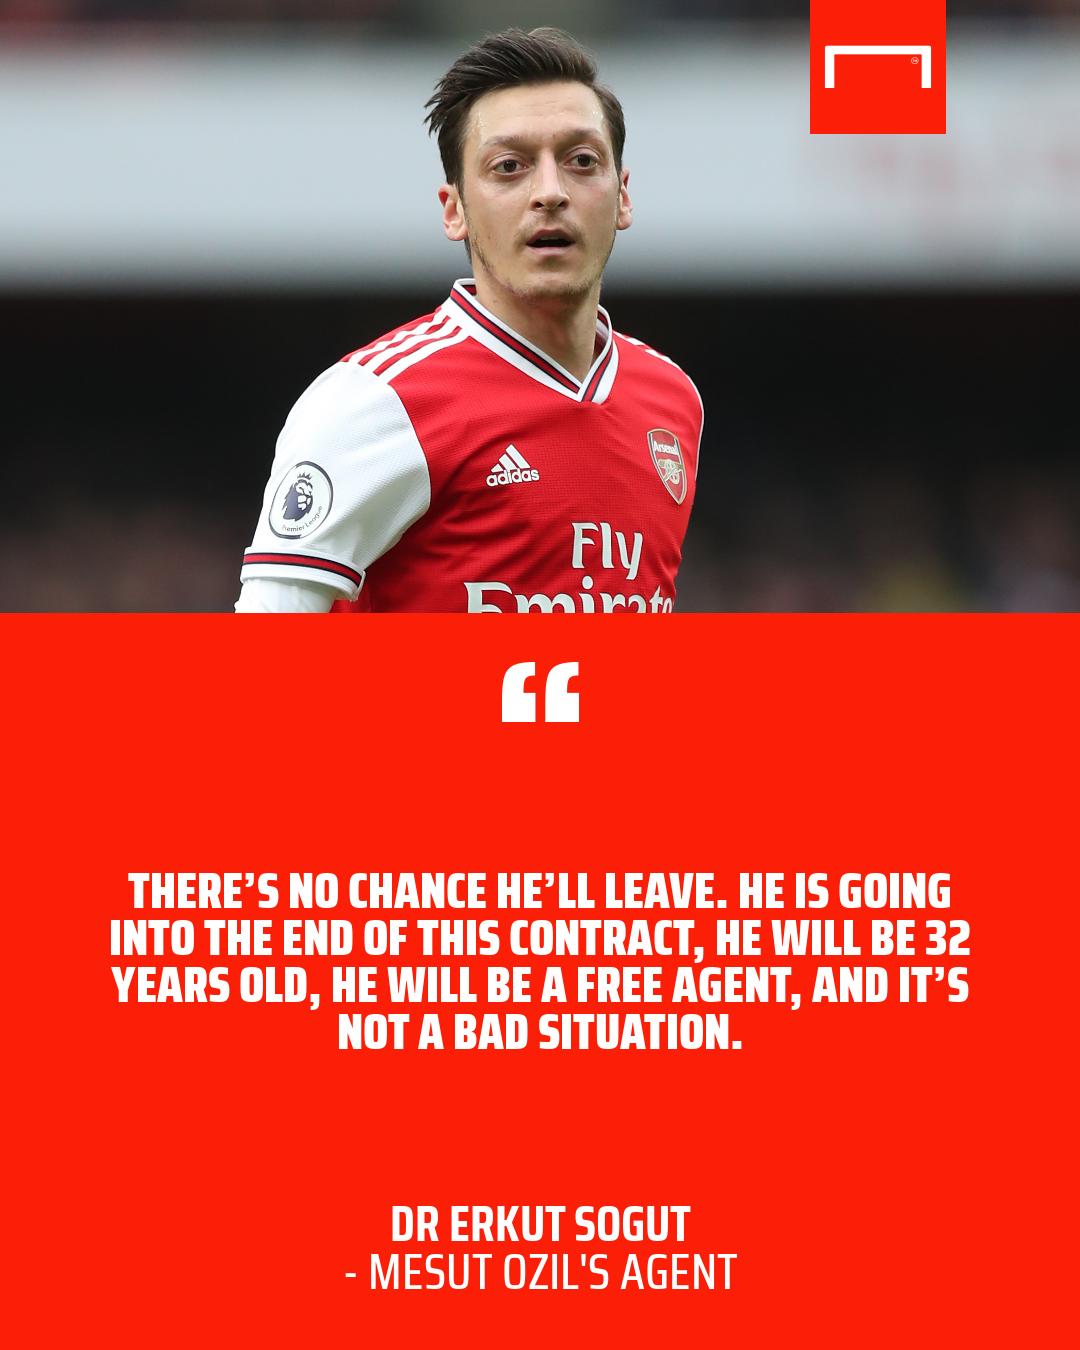 Arsenal's Mustafi to miss start of next season after hamstring surgery